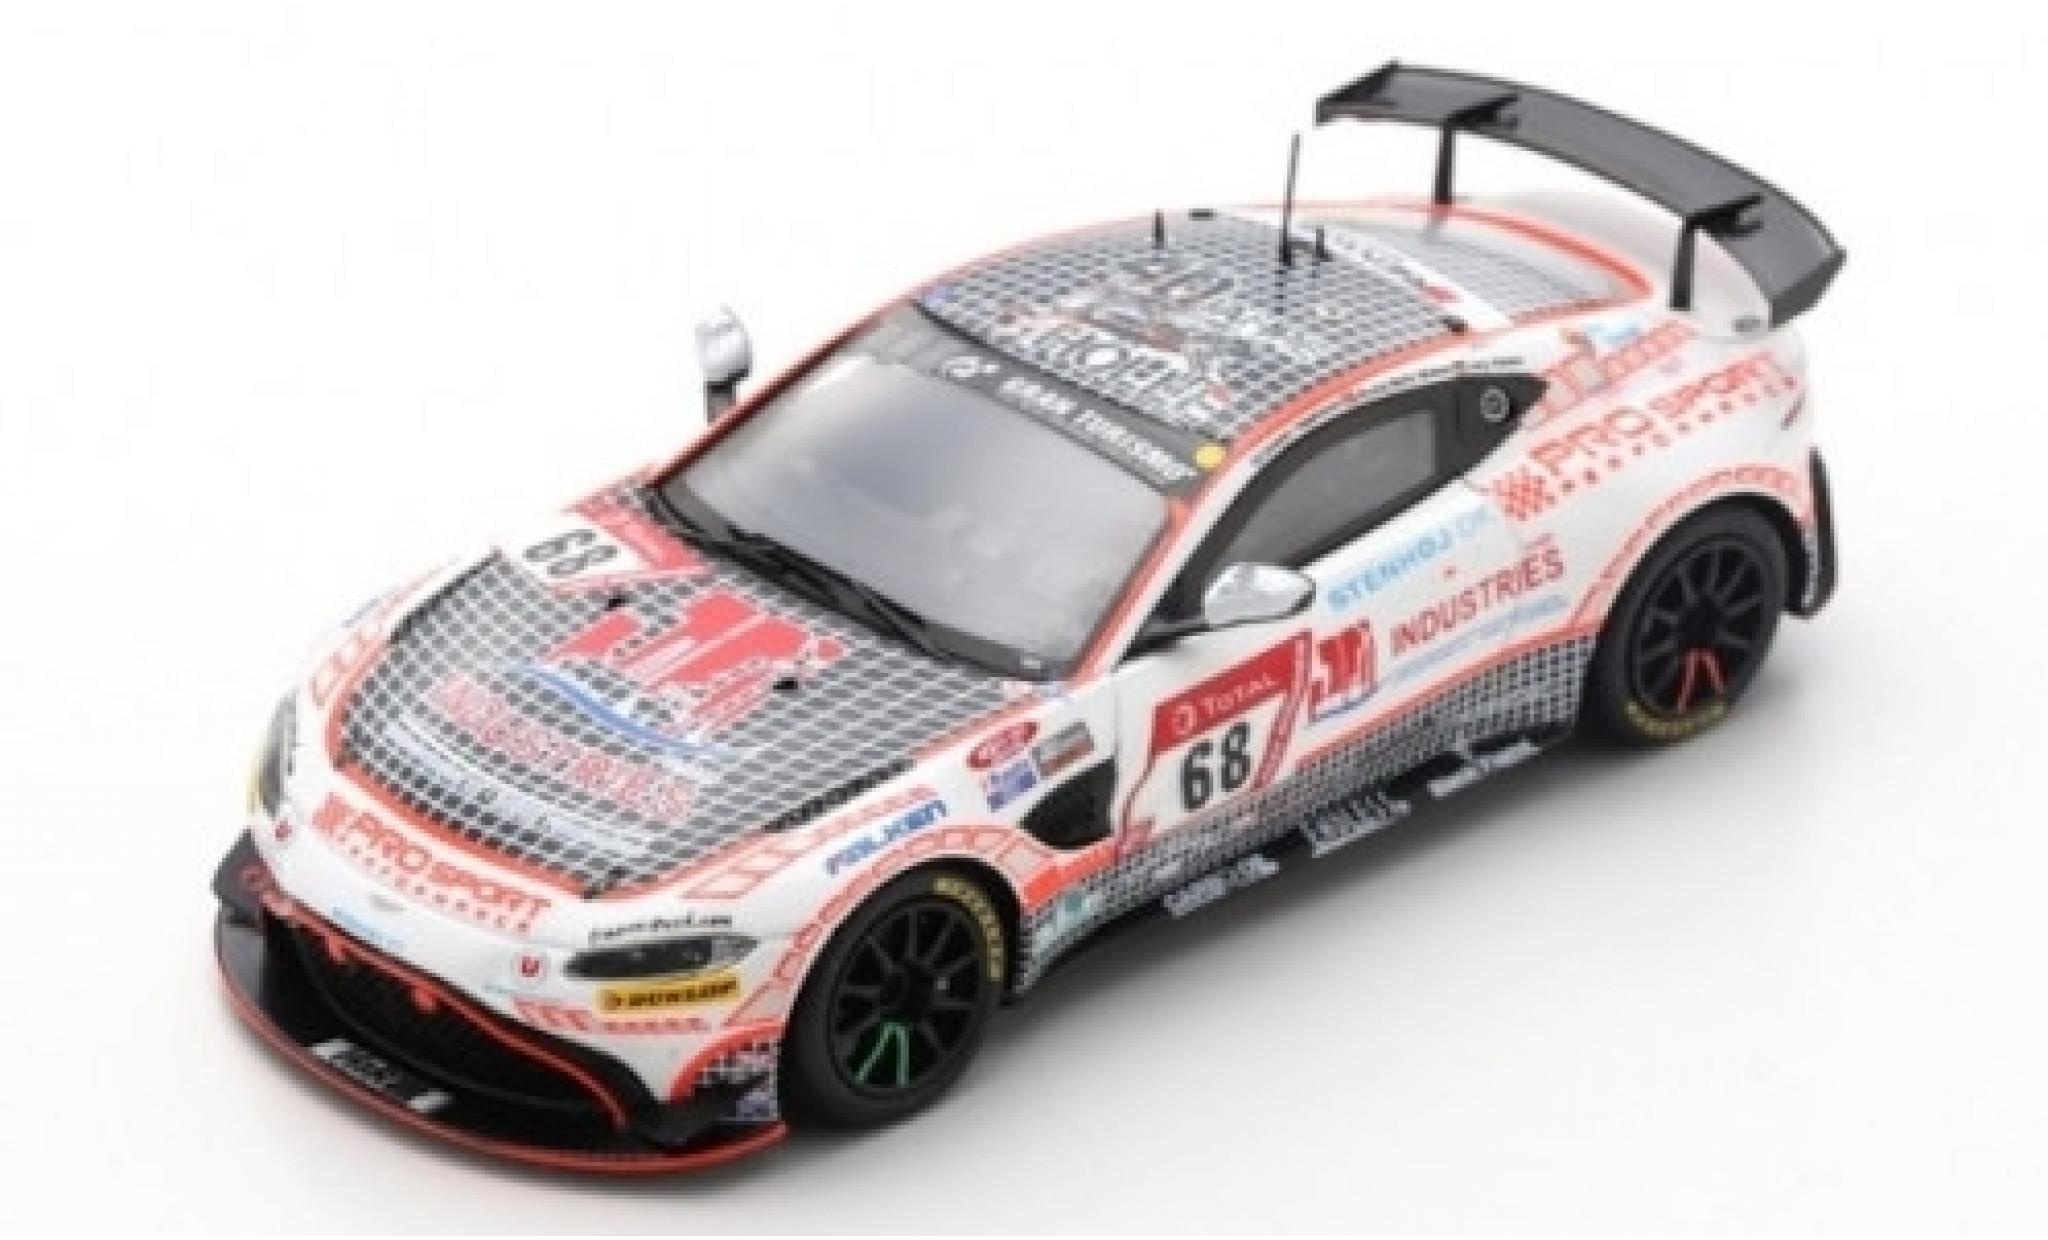 Aston Martin Vantage 1/43 Spark AMR GT4 No.68 Prosport-Performance GmbH 24h Nürburgring 2019 V.Jörg/N.Moller-Madsen/J.Lappalainen